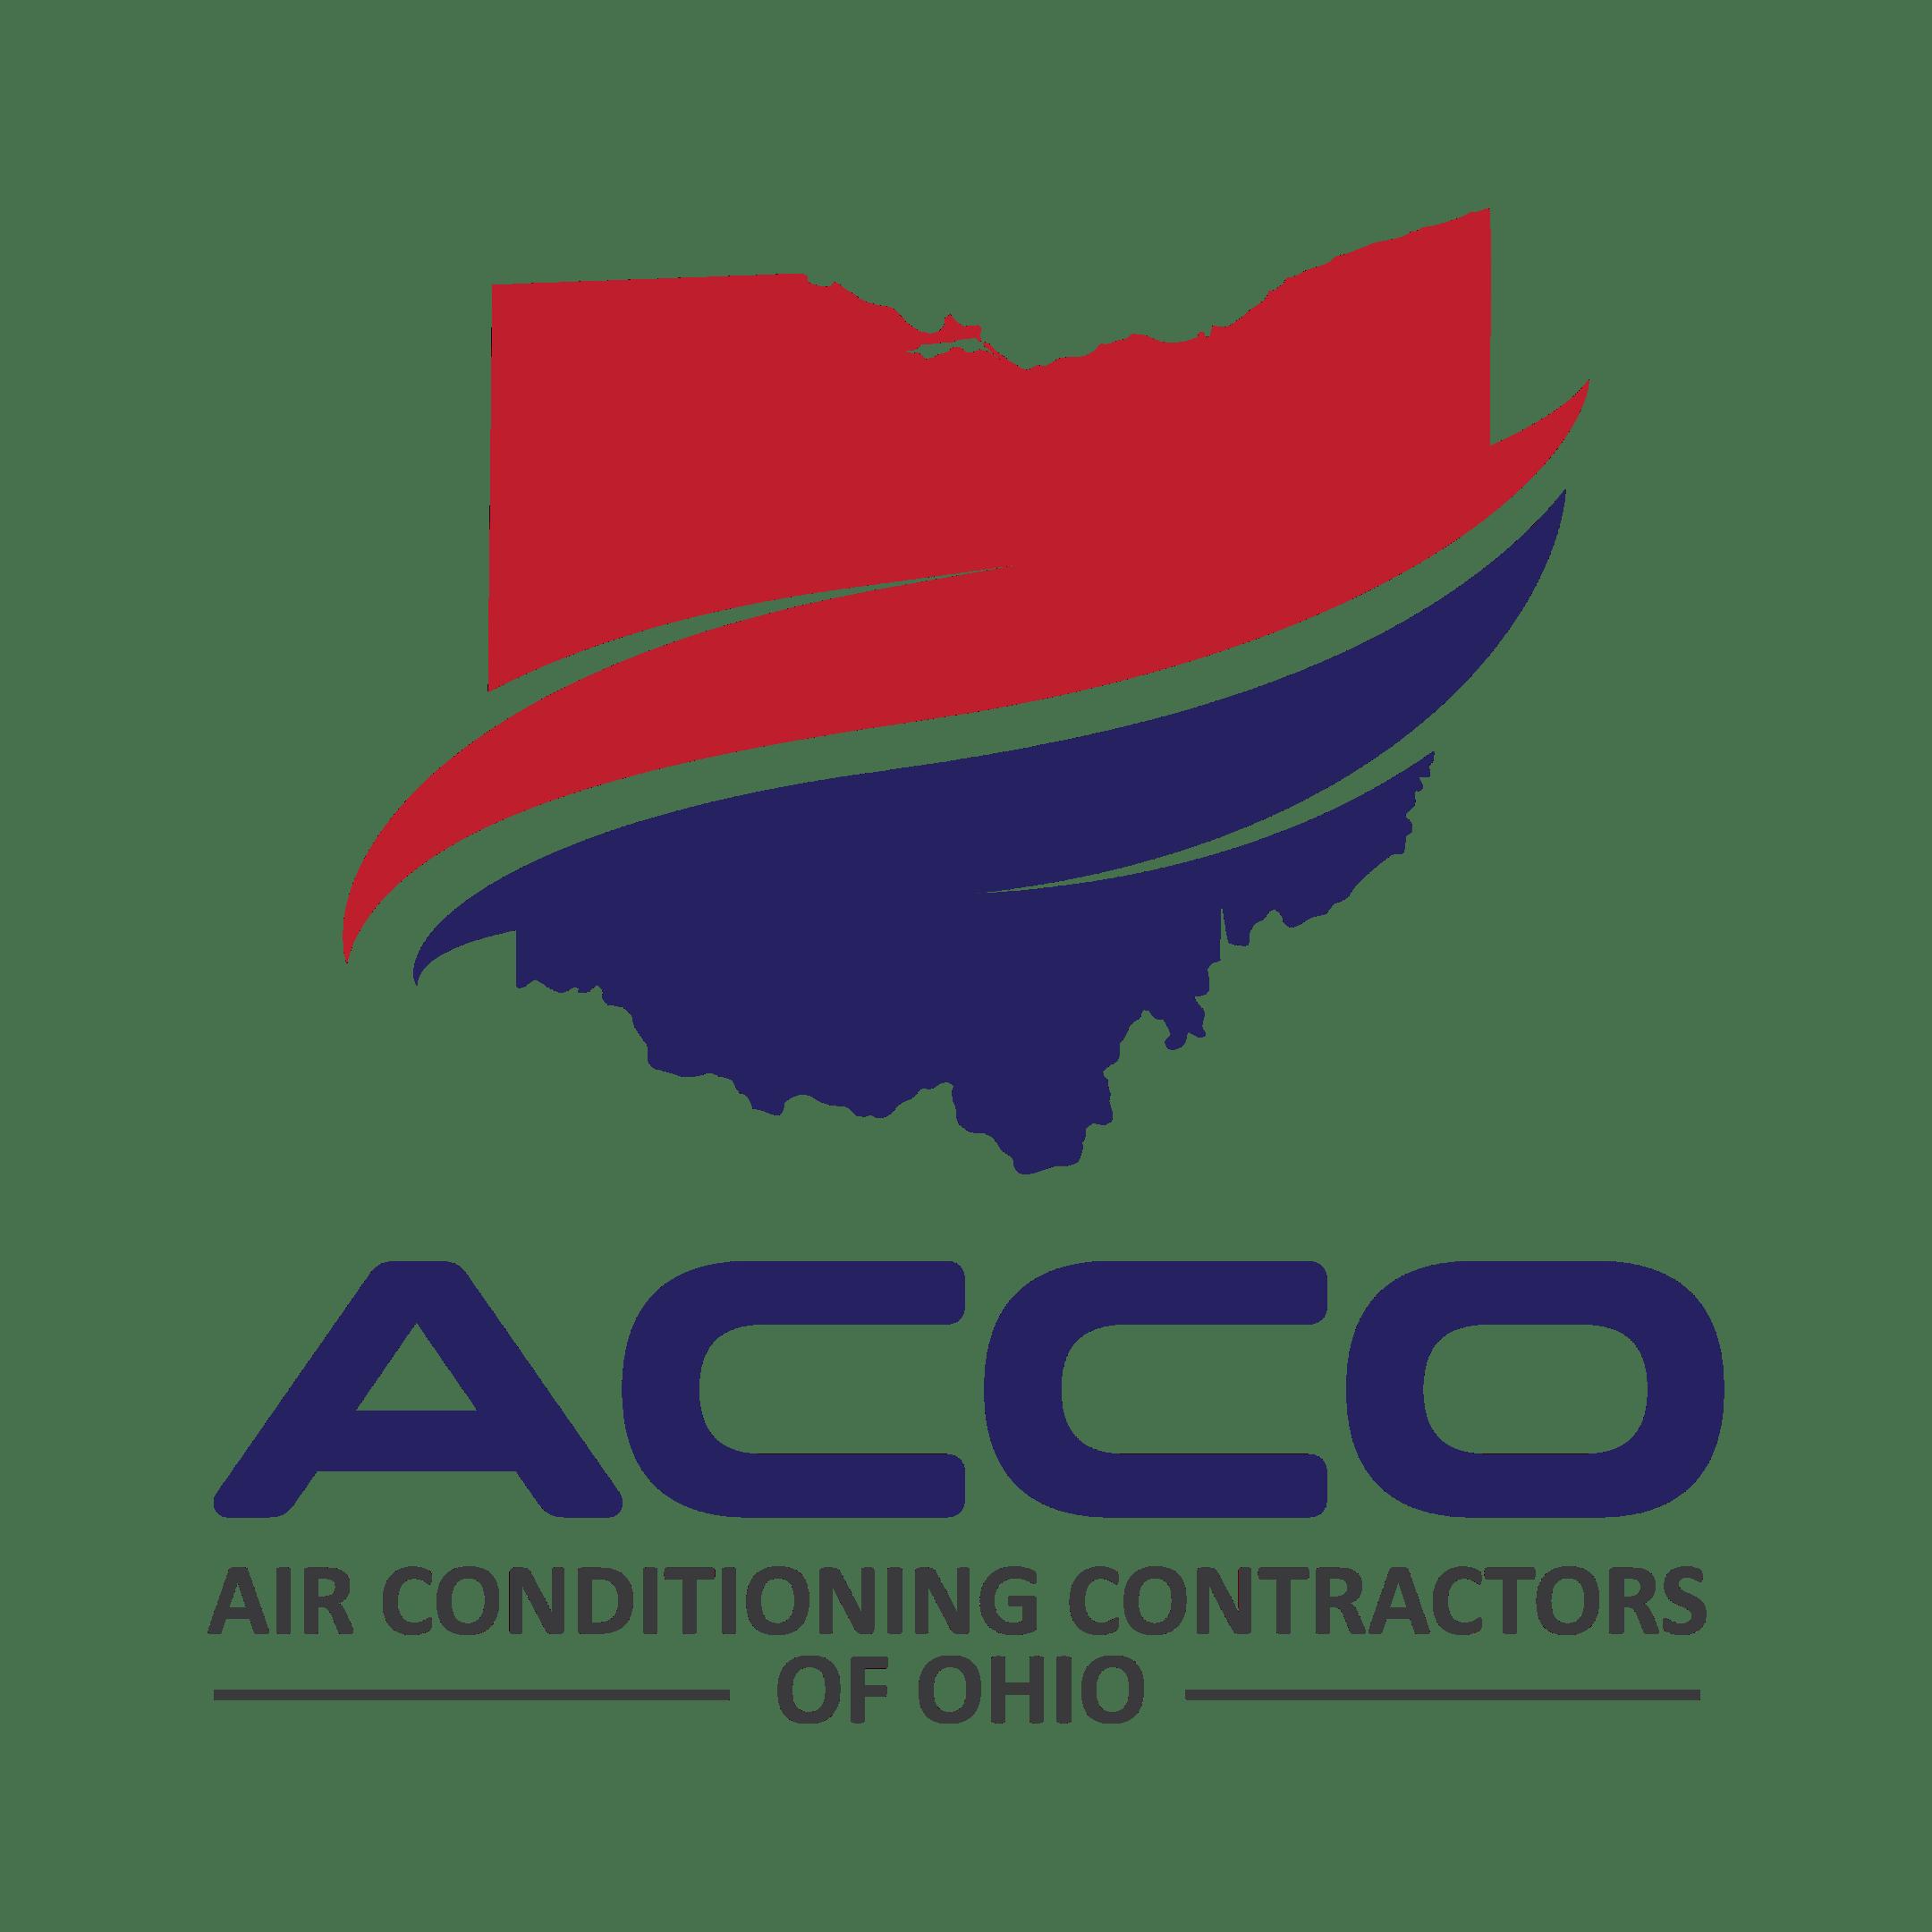 ACCCO / Air Conditioning Contractors of Ohio